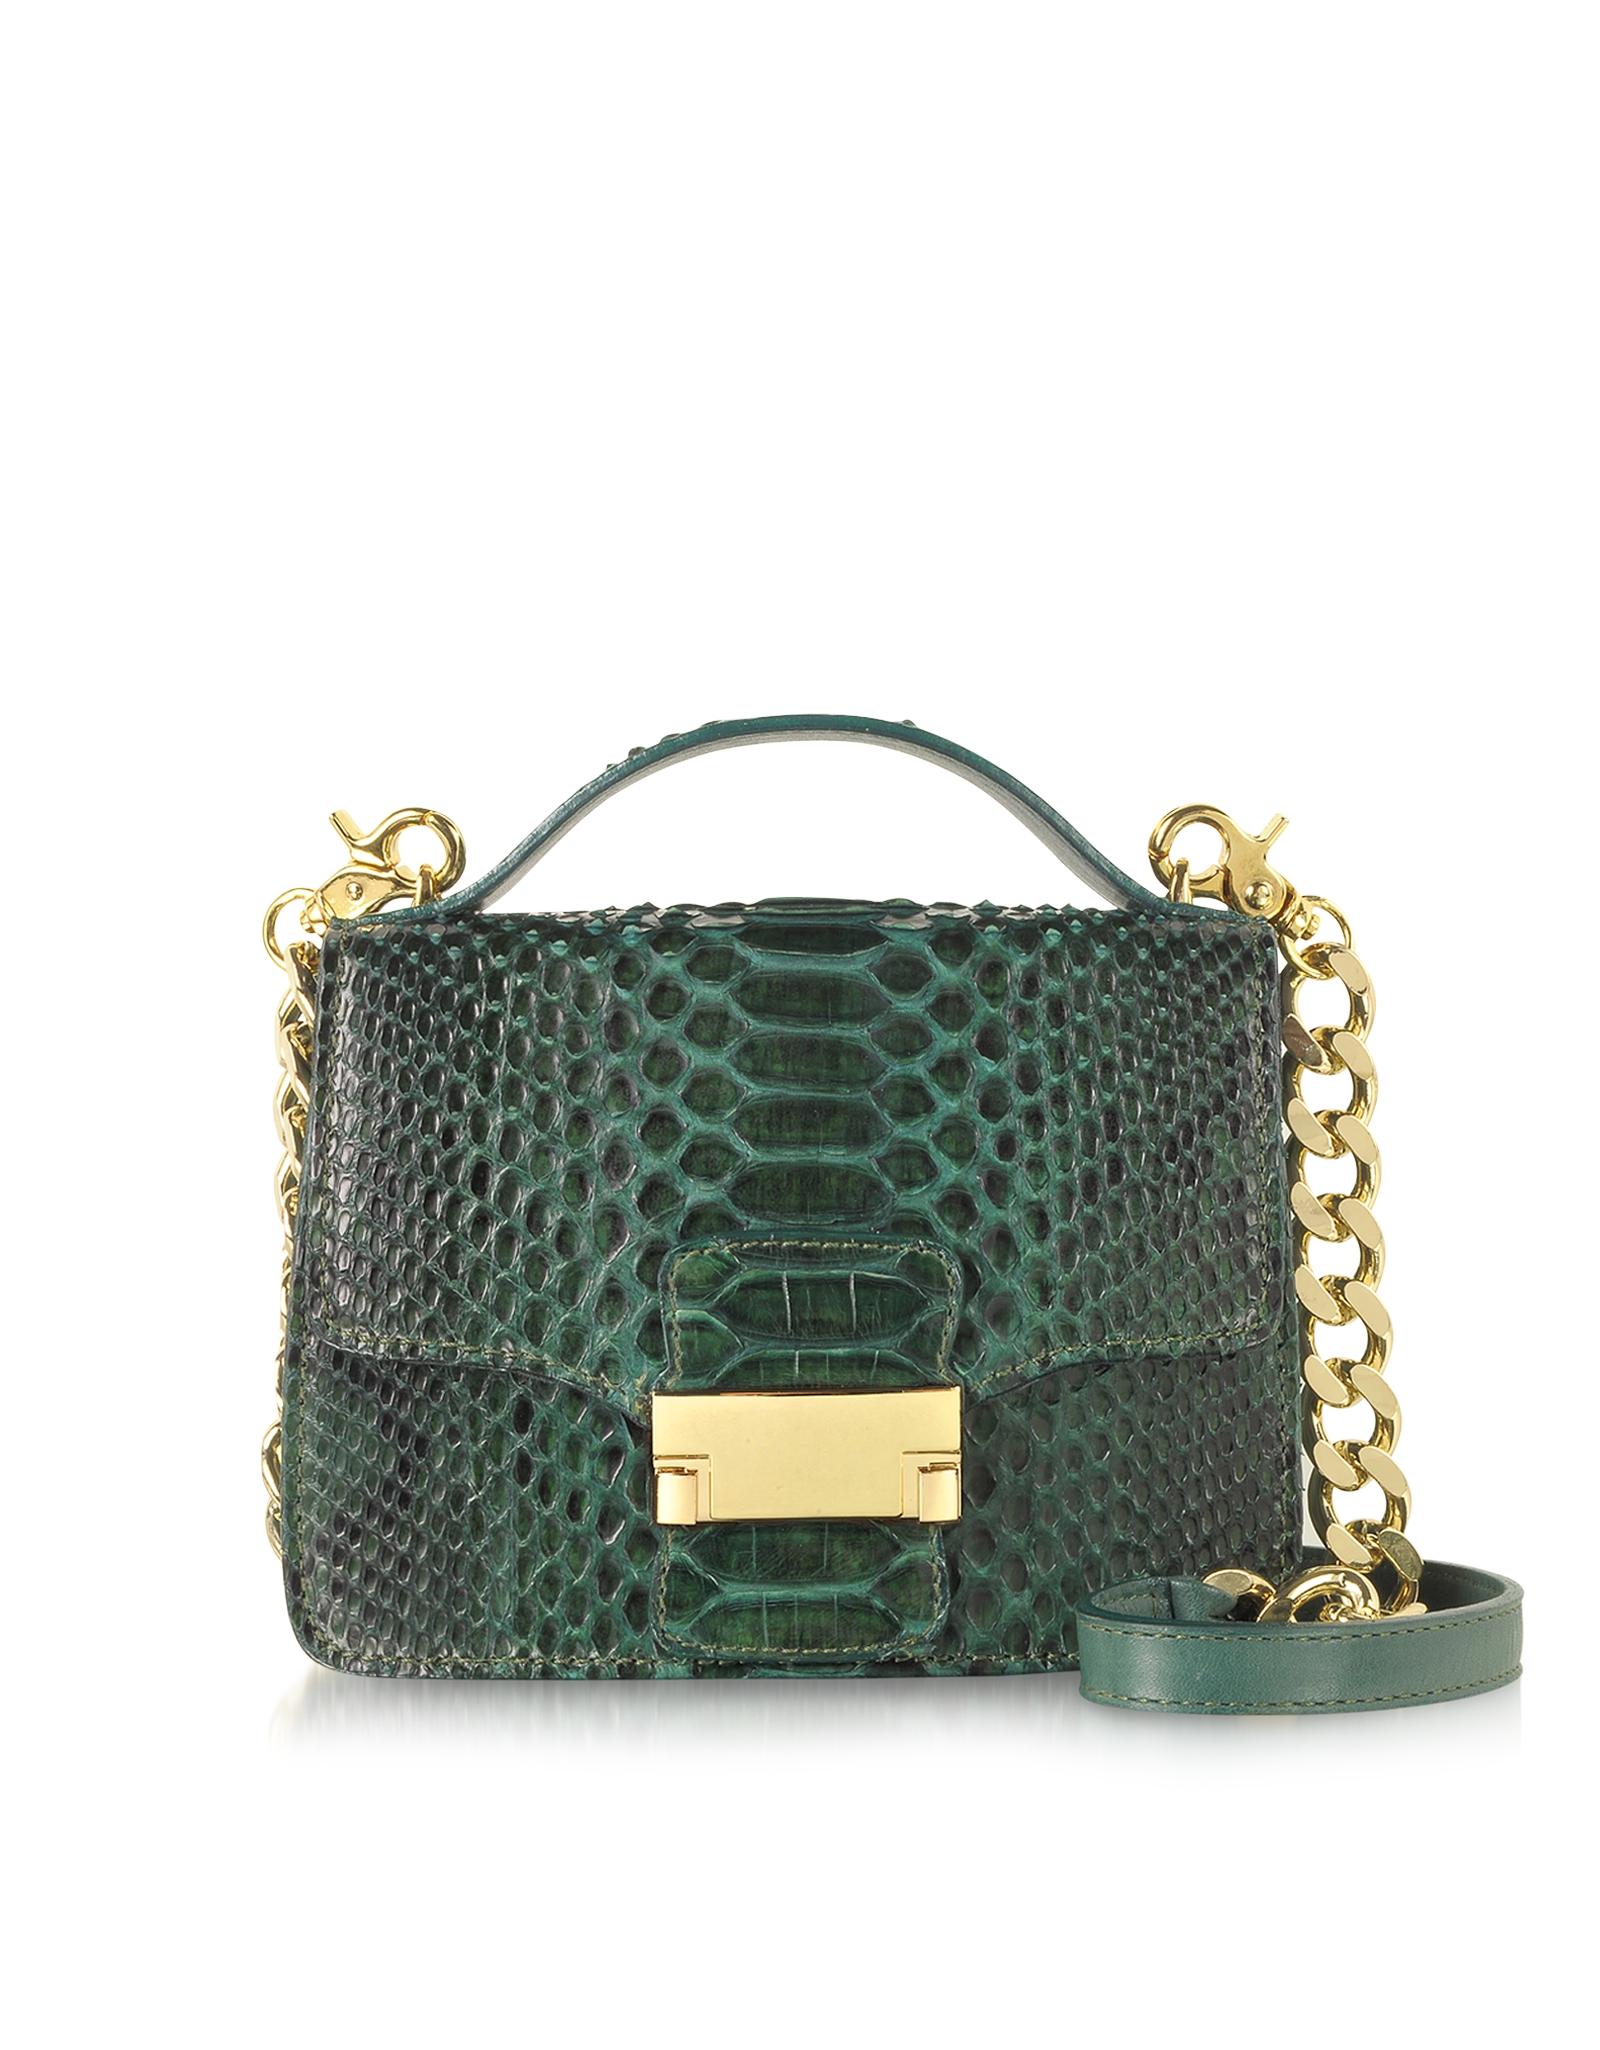 Ghibli emerald green python leather shoulder bag